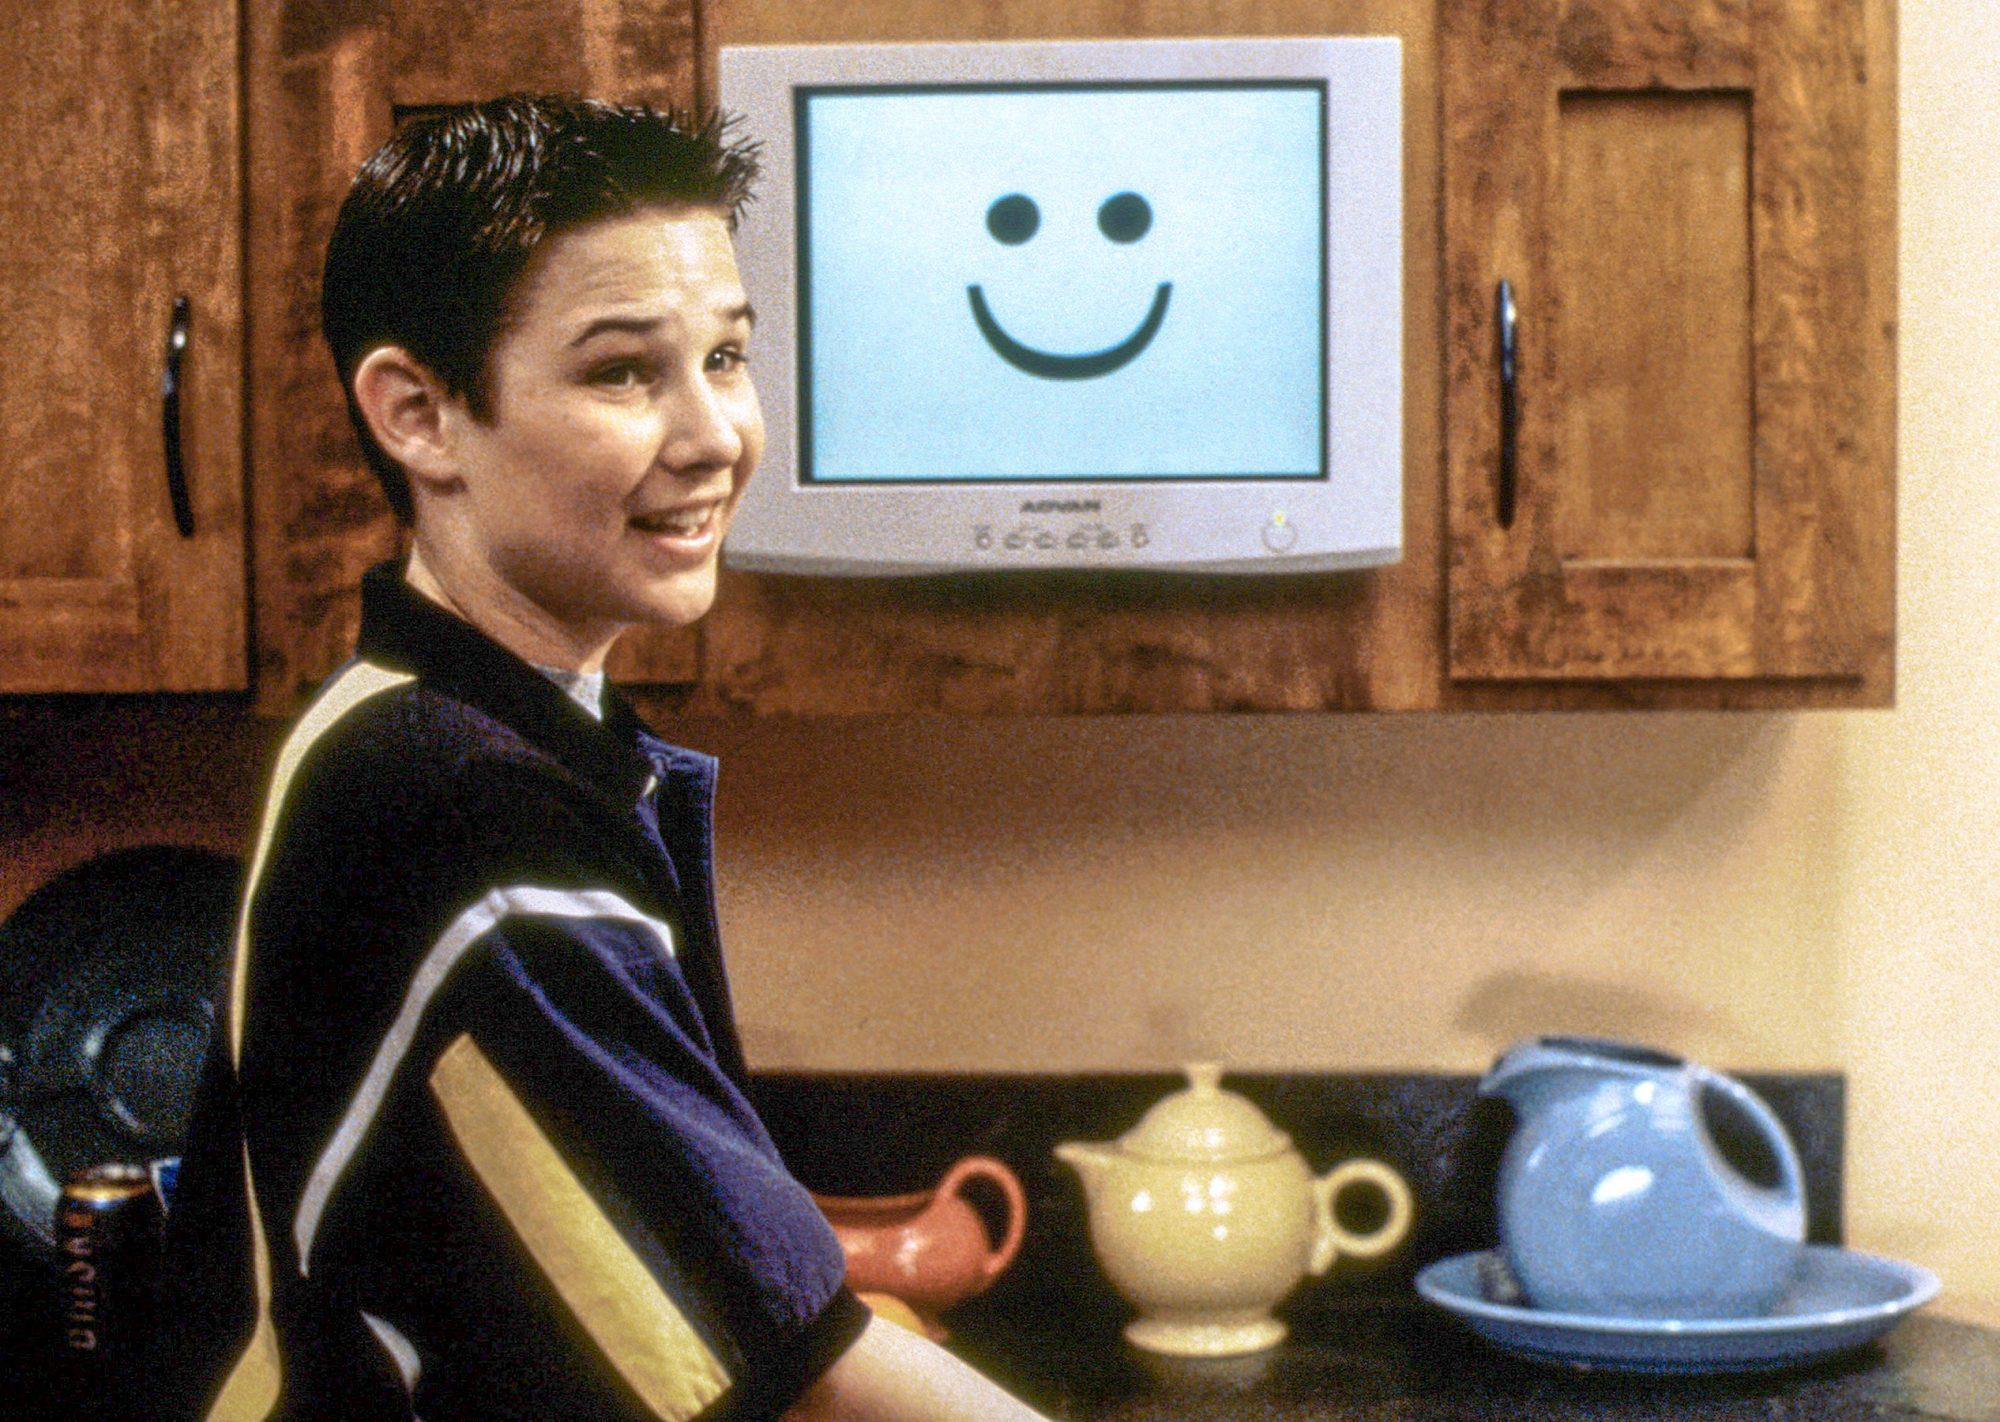 SMART HOUSE, Ryan Merriman, 1999. © Disney Channel  / Courtesy: Everett Collection